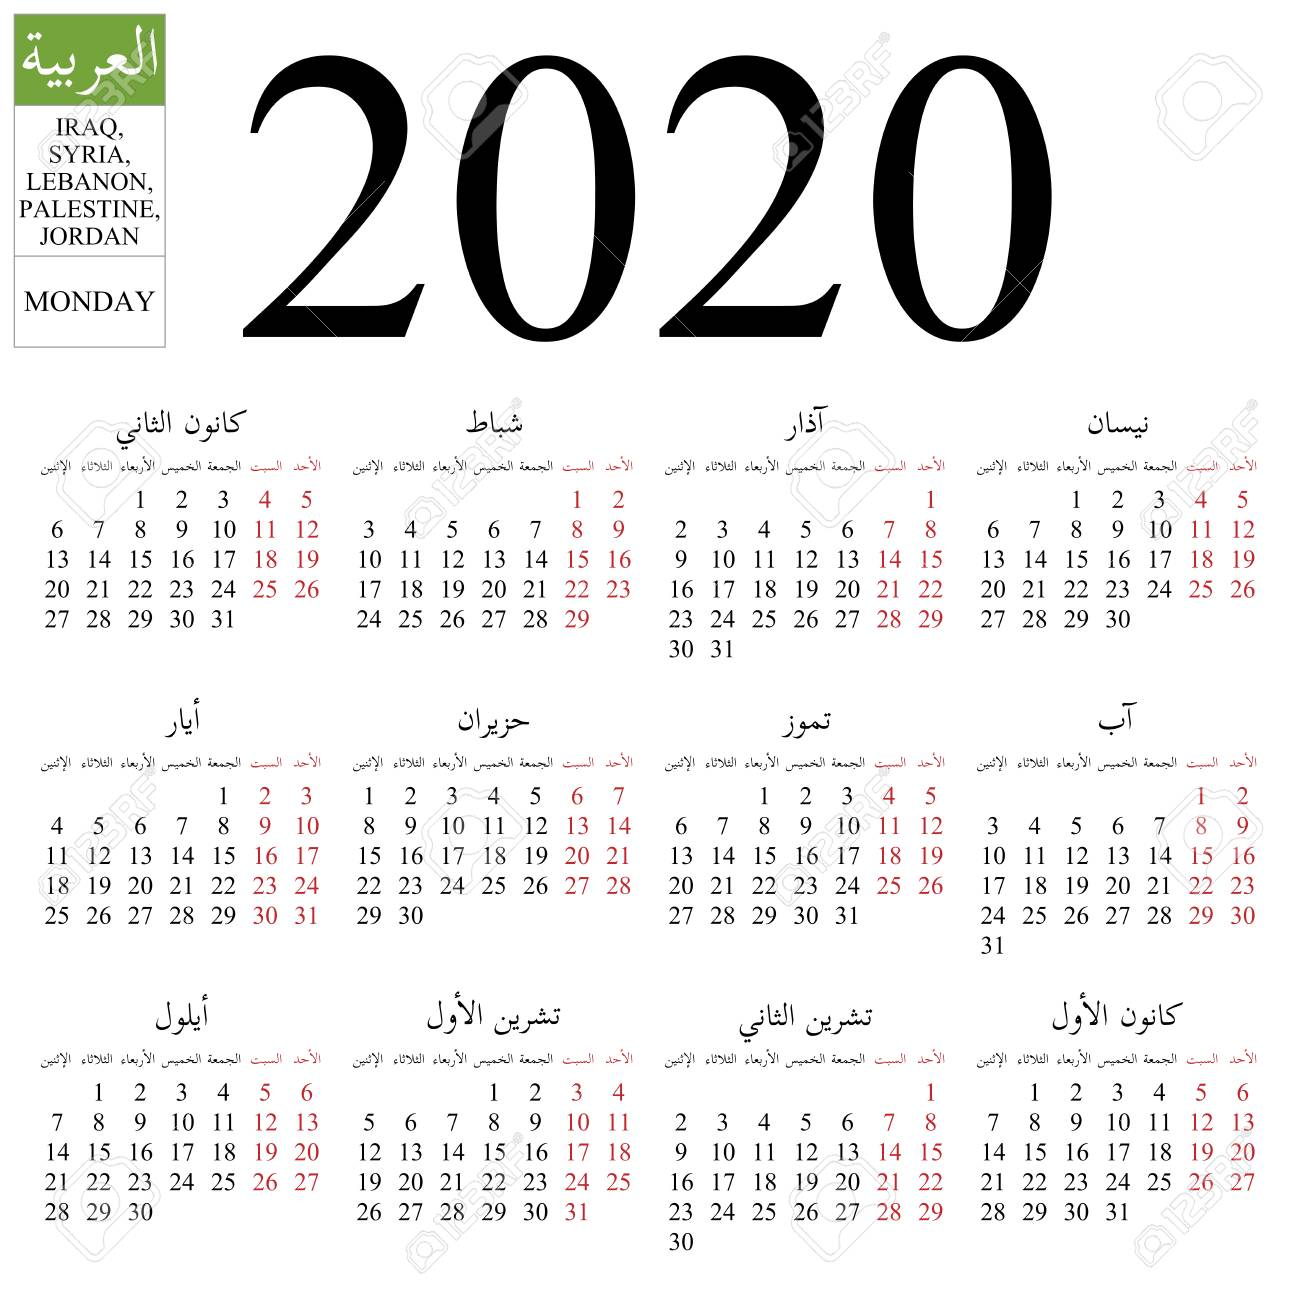 Jordans Calendar 2020 Simple Annual 2020 Year Wall Calendar. Arabic Language (names